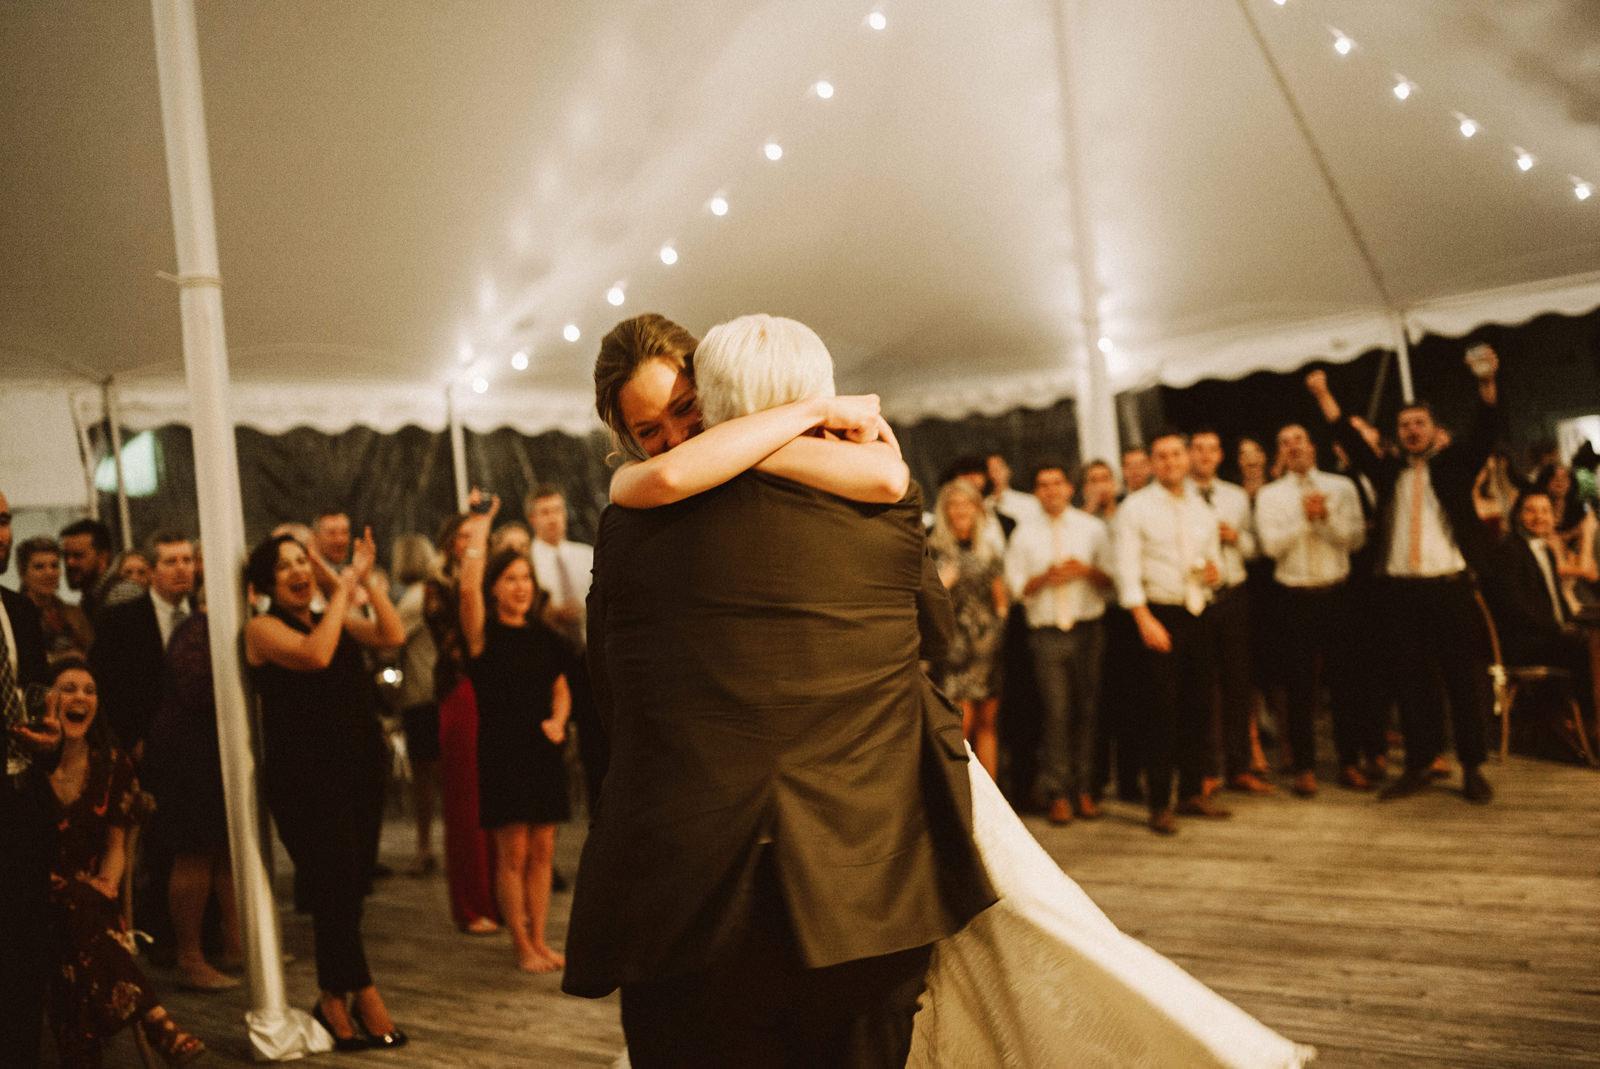 bridgeport-wedding-162 BRIDGEPORT, CONNECTICUT BACKYARD WEDDING